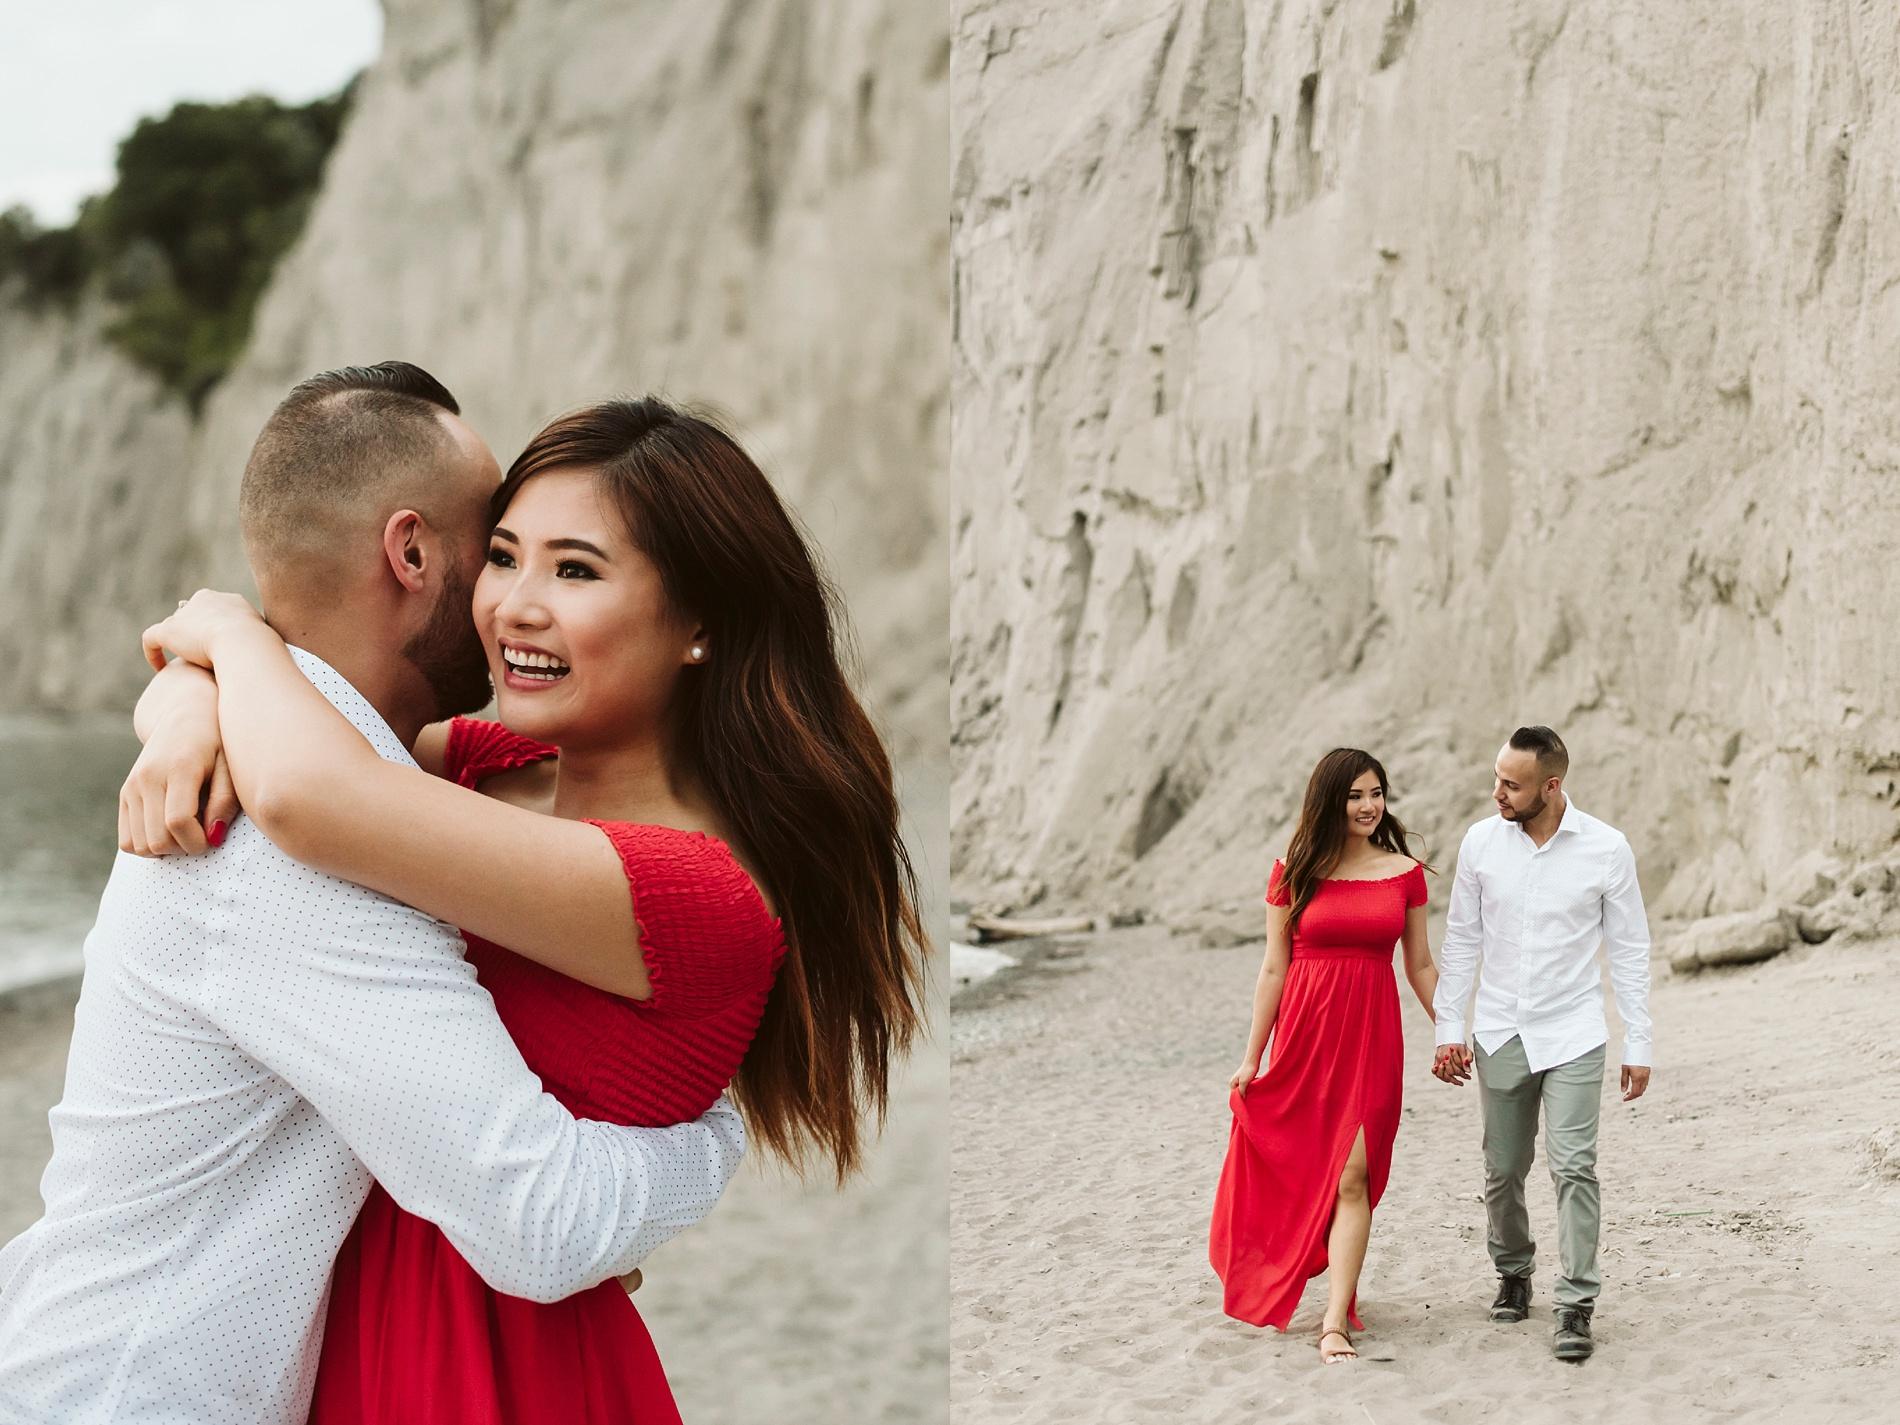 Scarborough_Bluffs_engagement_shoot_Best_Toronto_Wedding_Photographers_0020.jpg